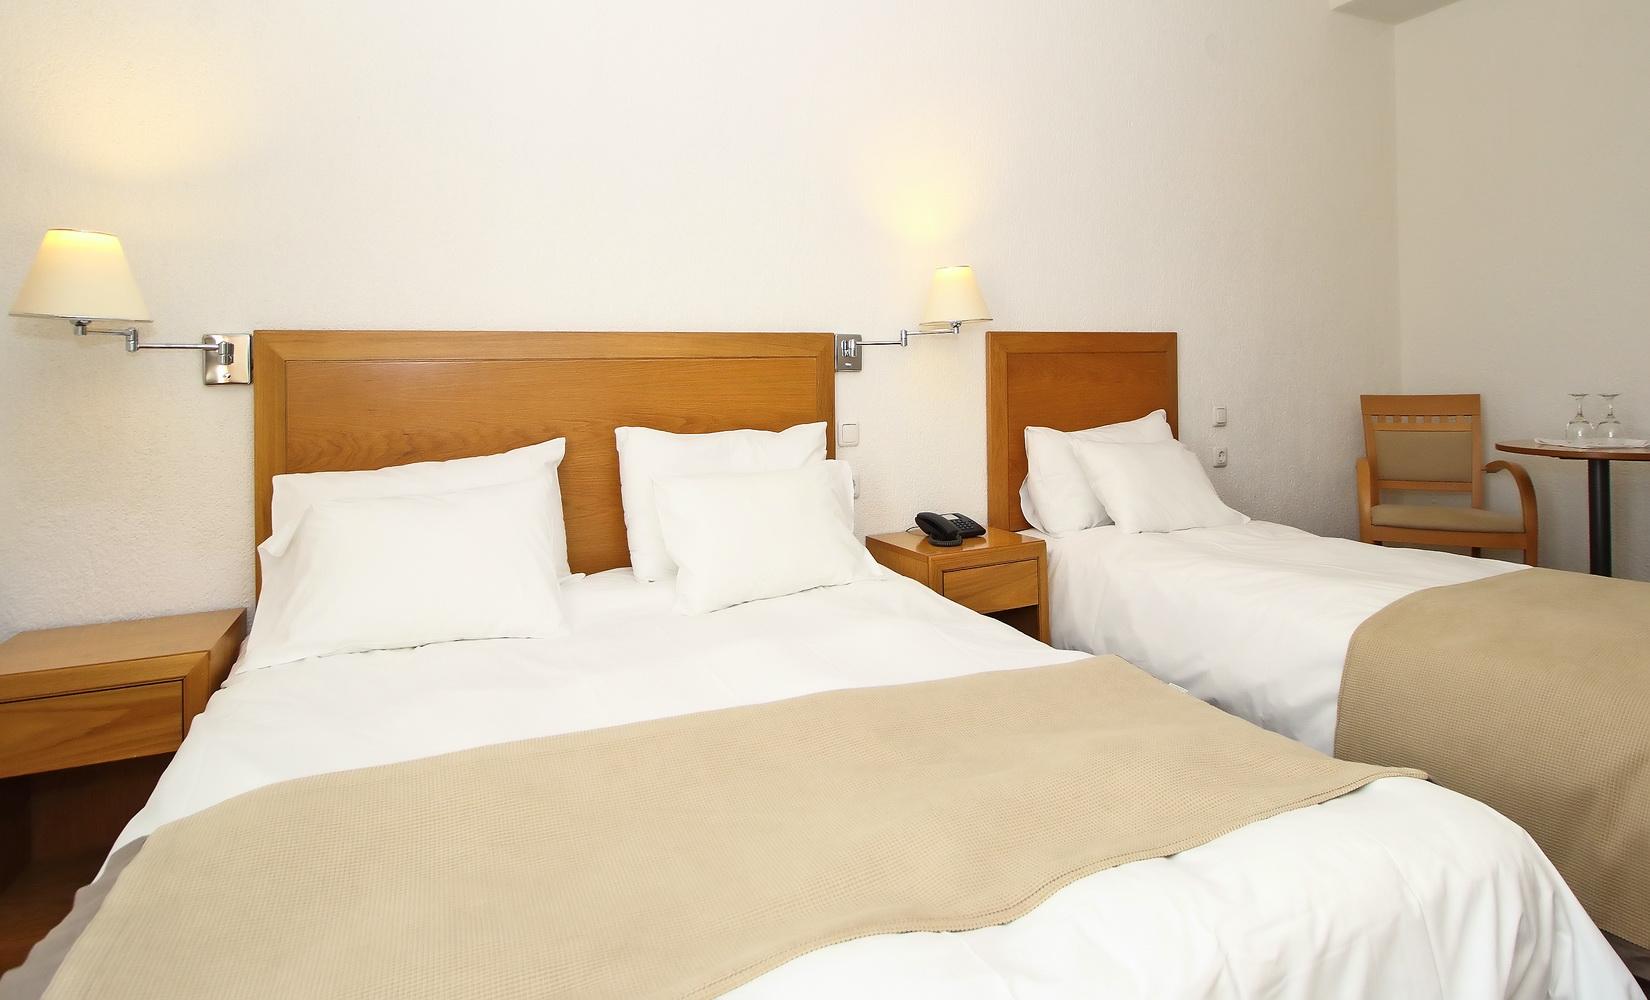 PARNASSIA HOTEL TRIPLE ROOM 2